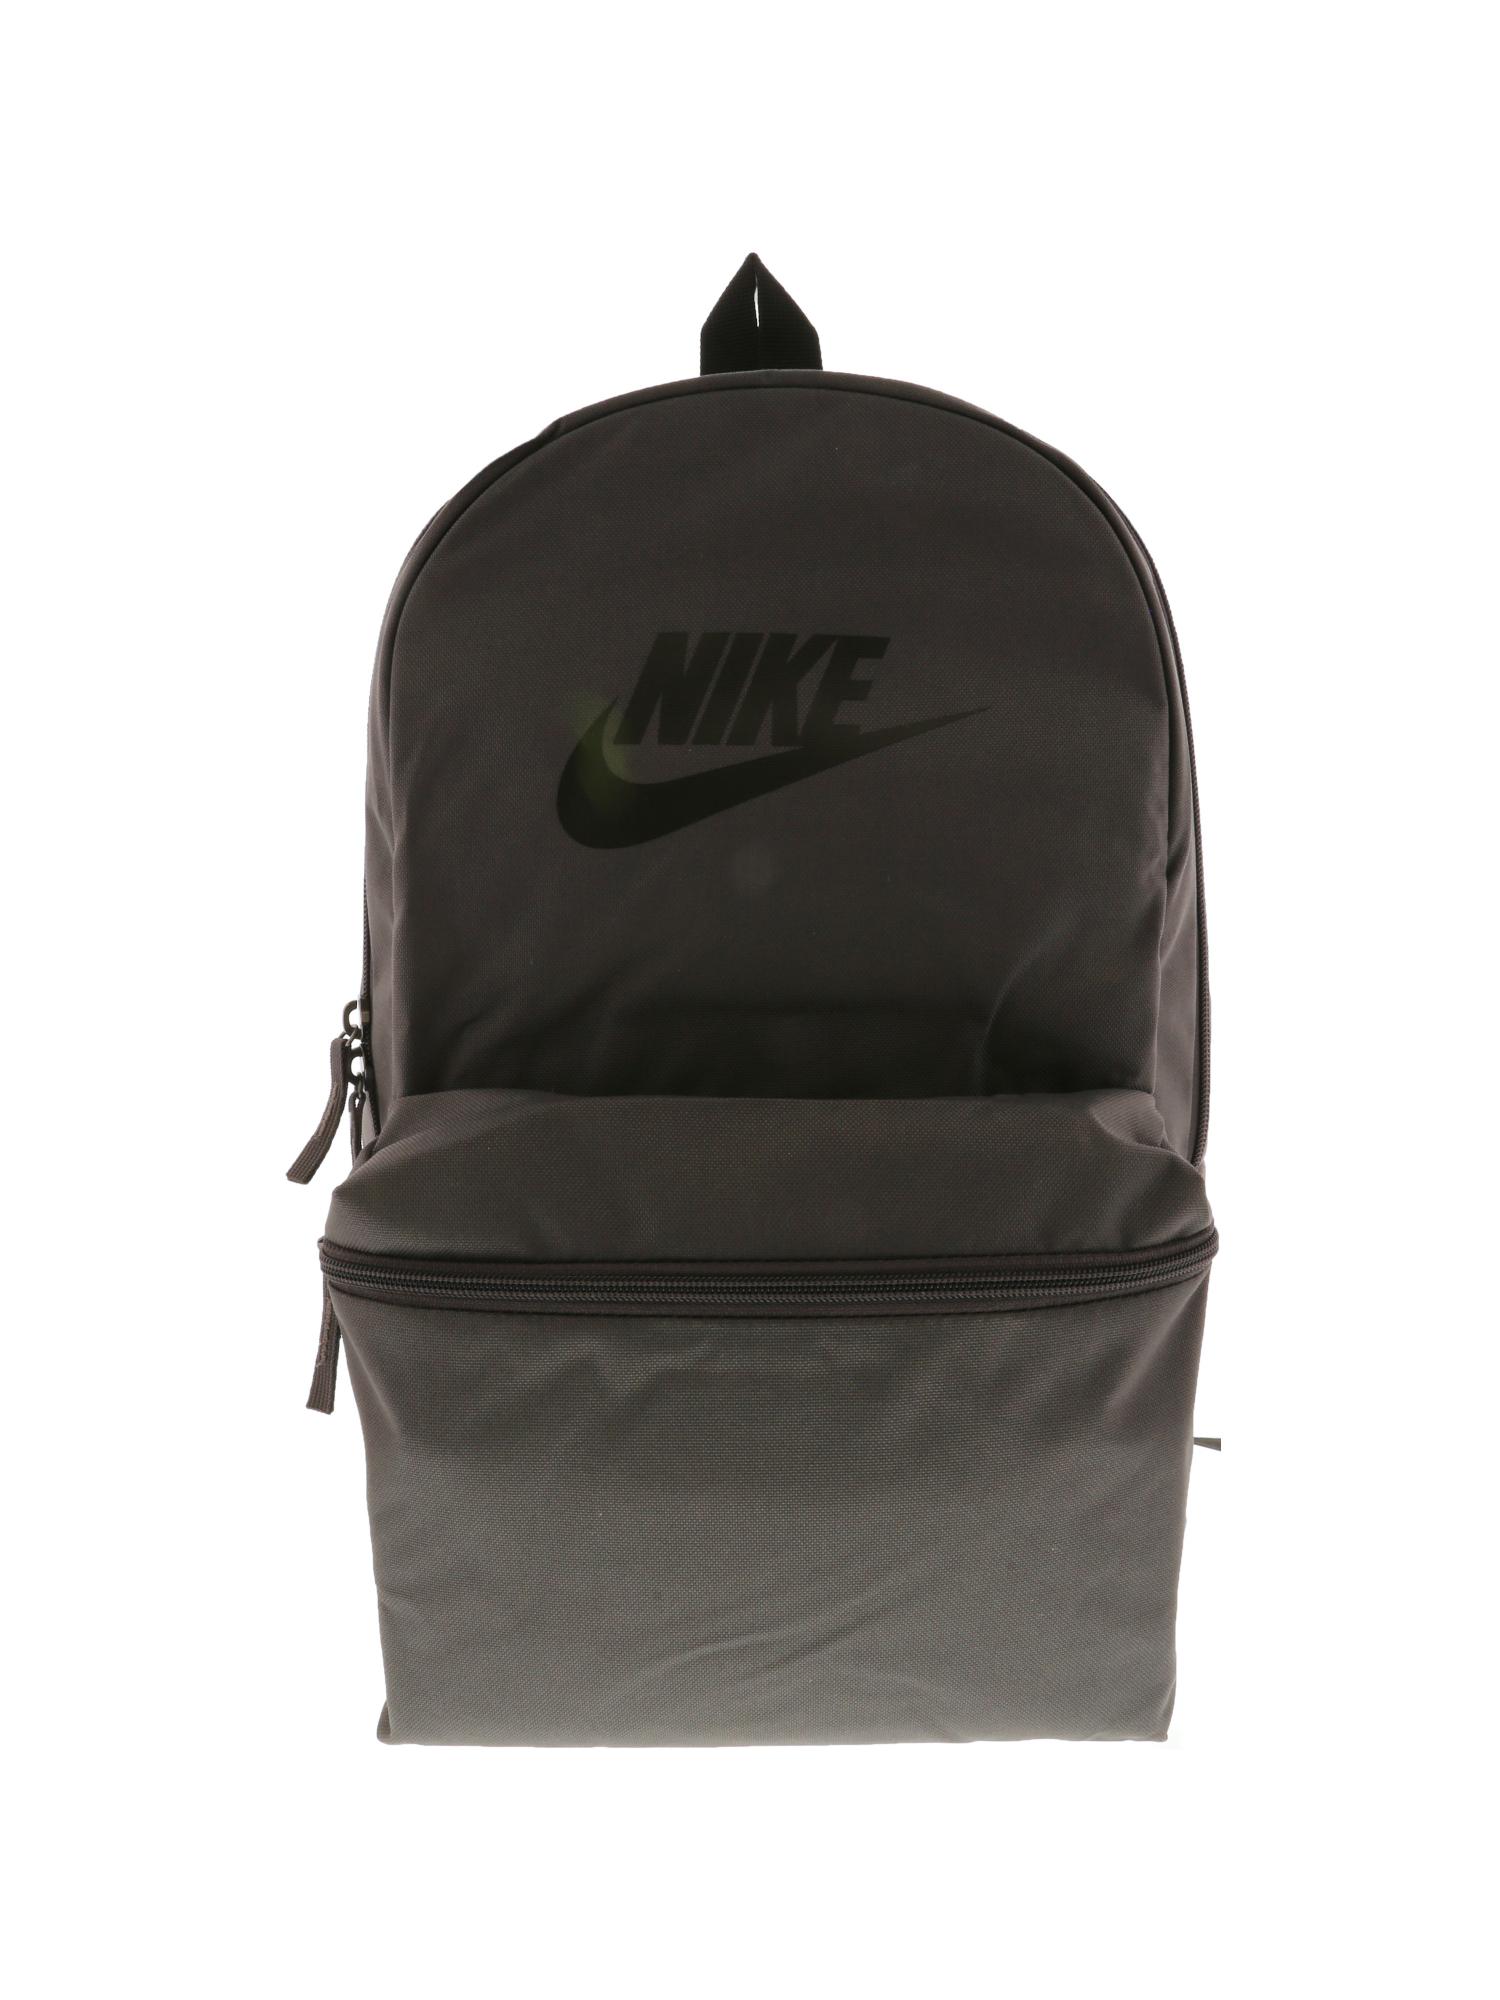 Nike-Heritage-Polyester-Backpack thumbnail 12